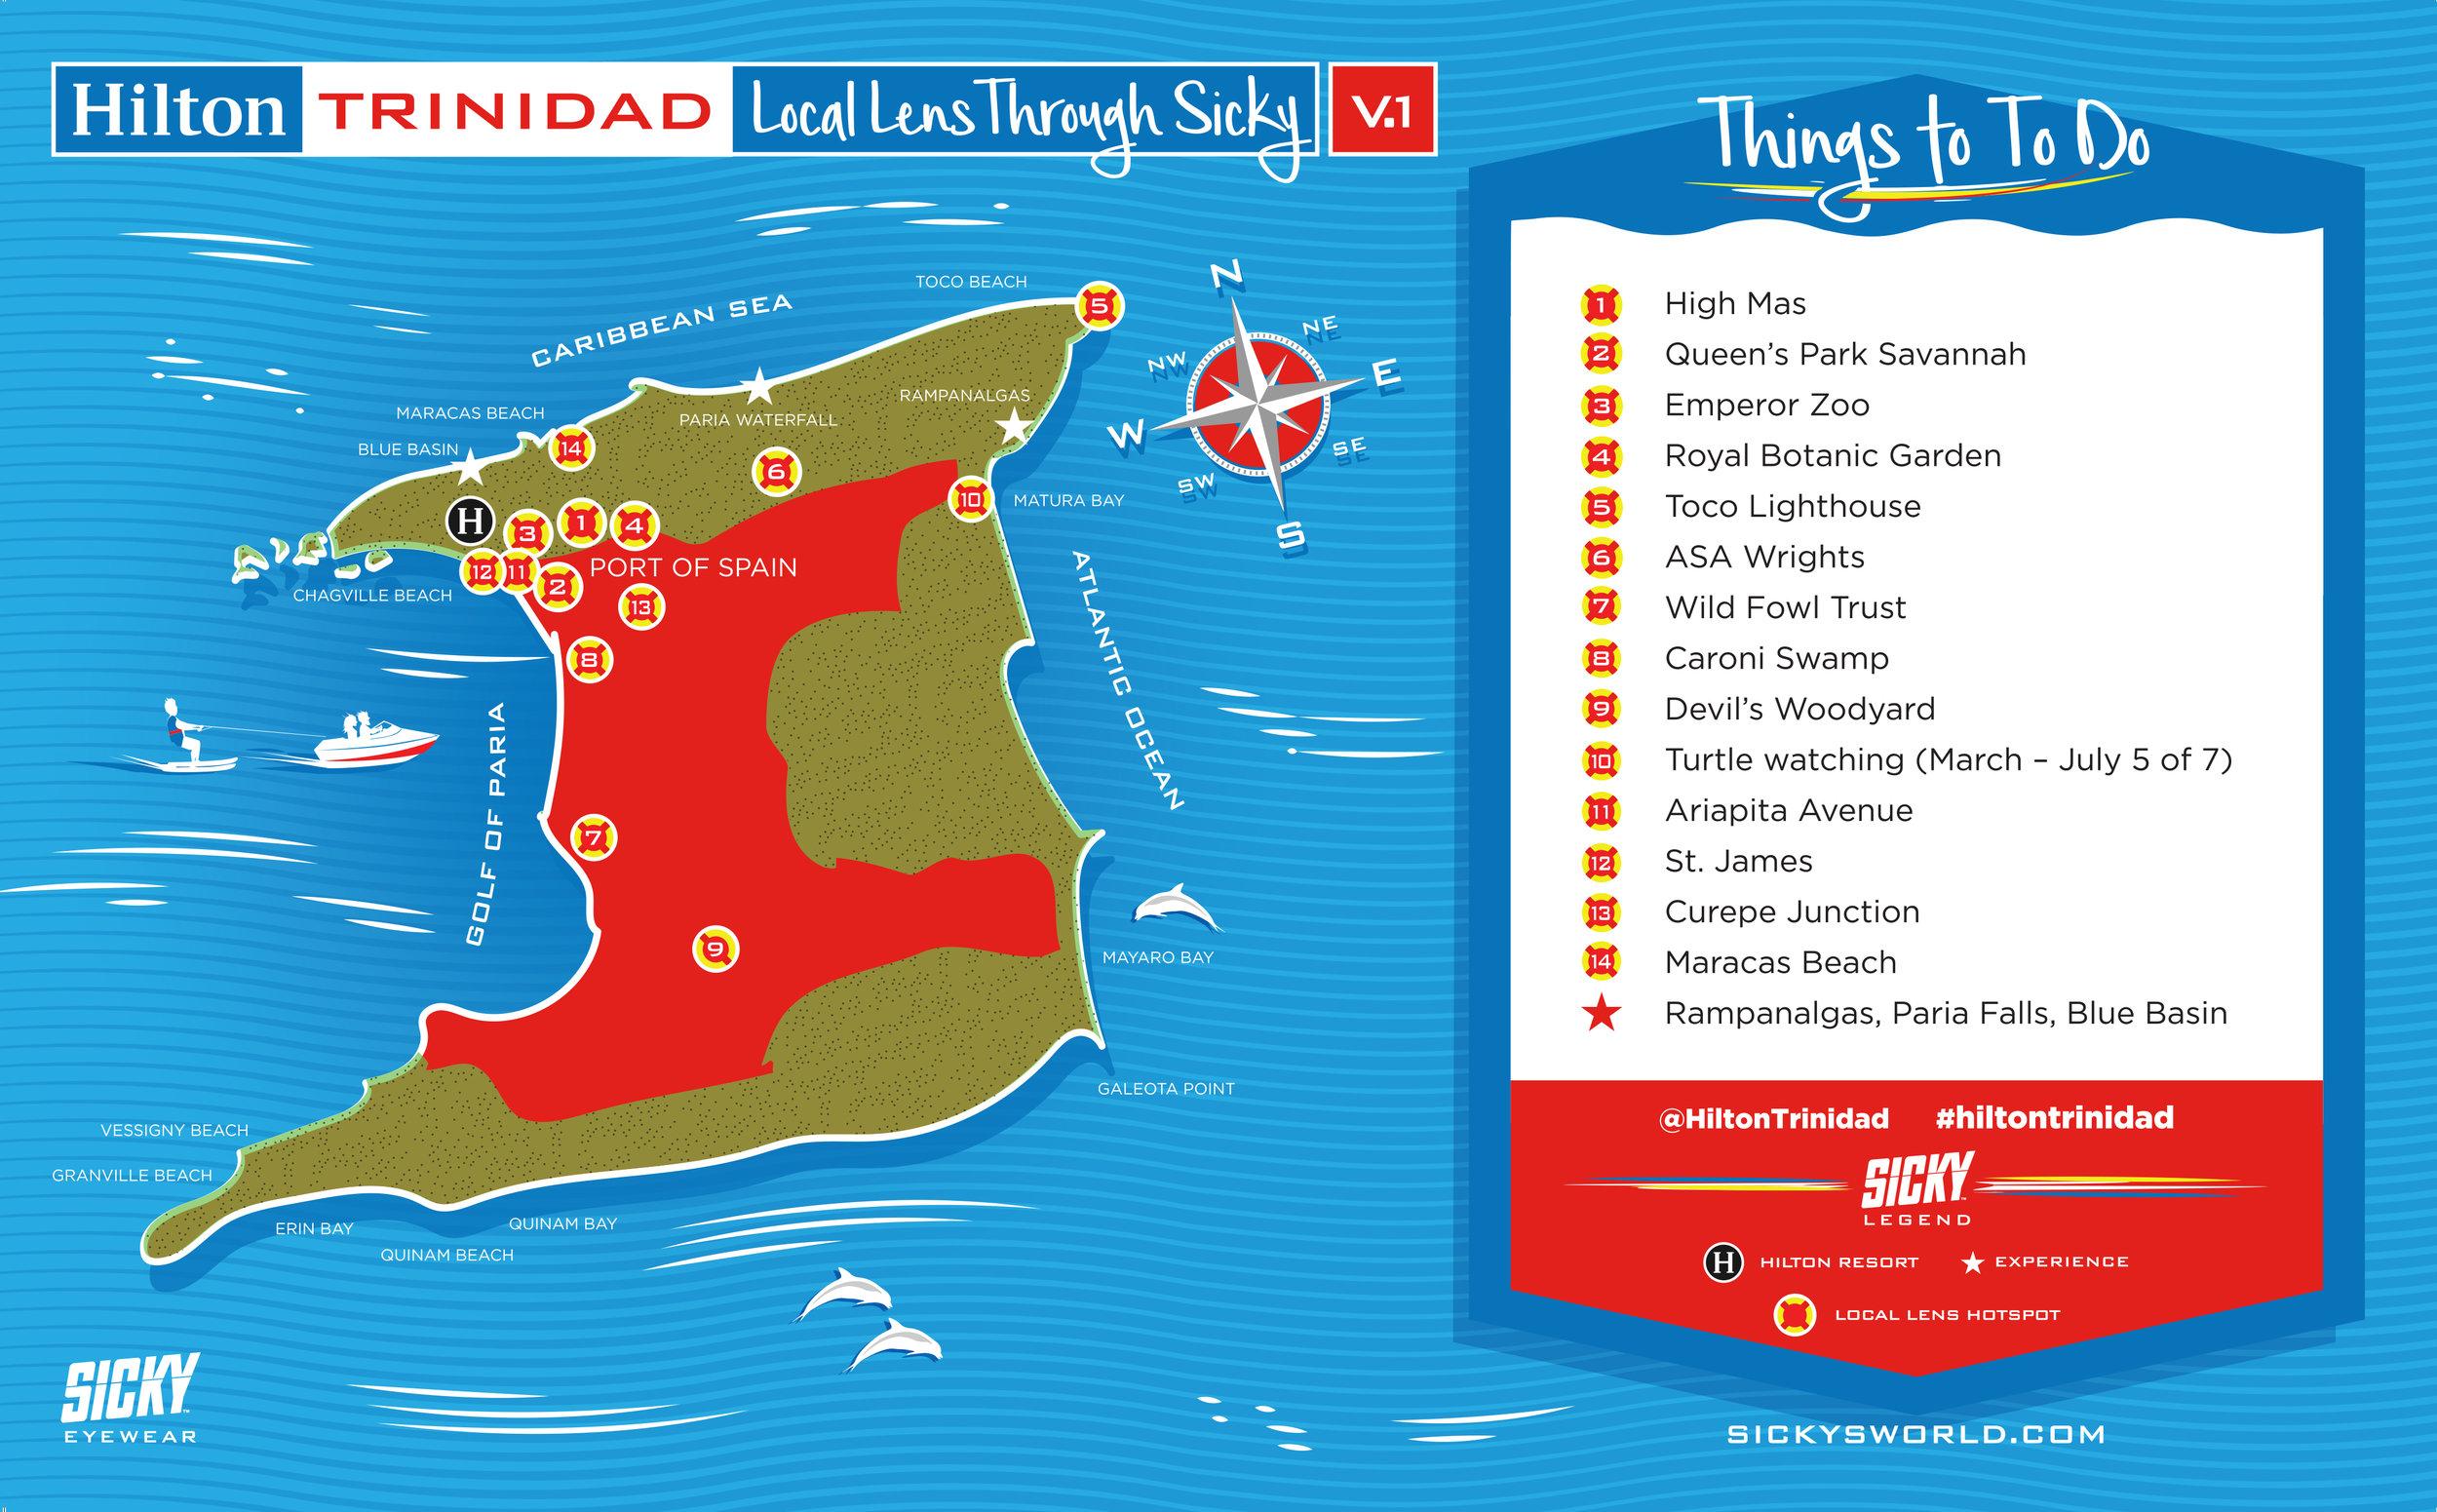 Hilton-Sicky Trinidad Map-v1